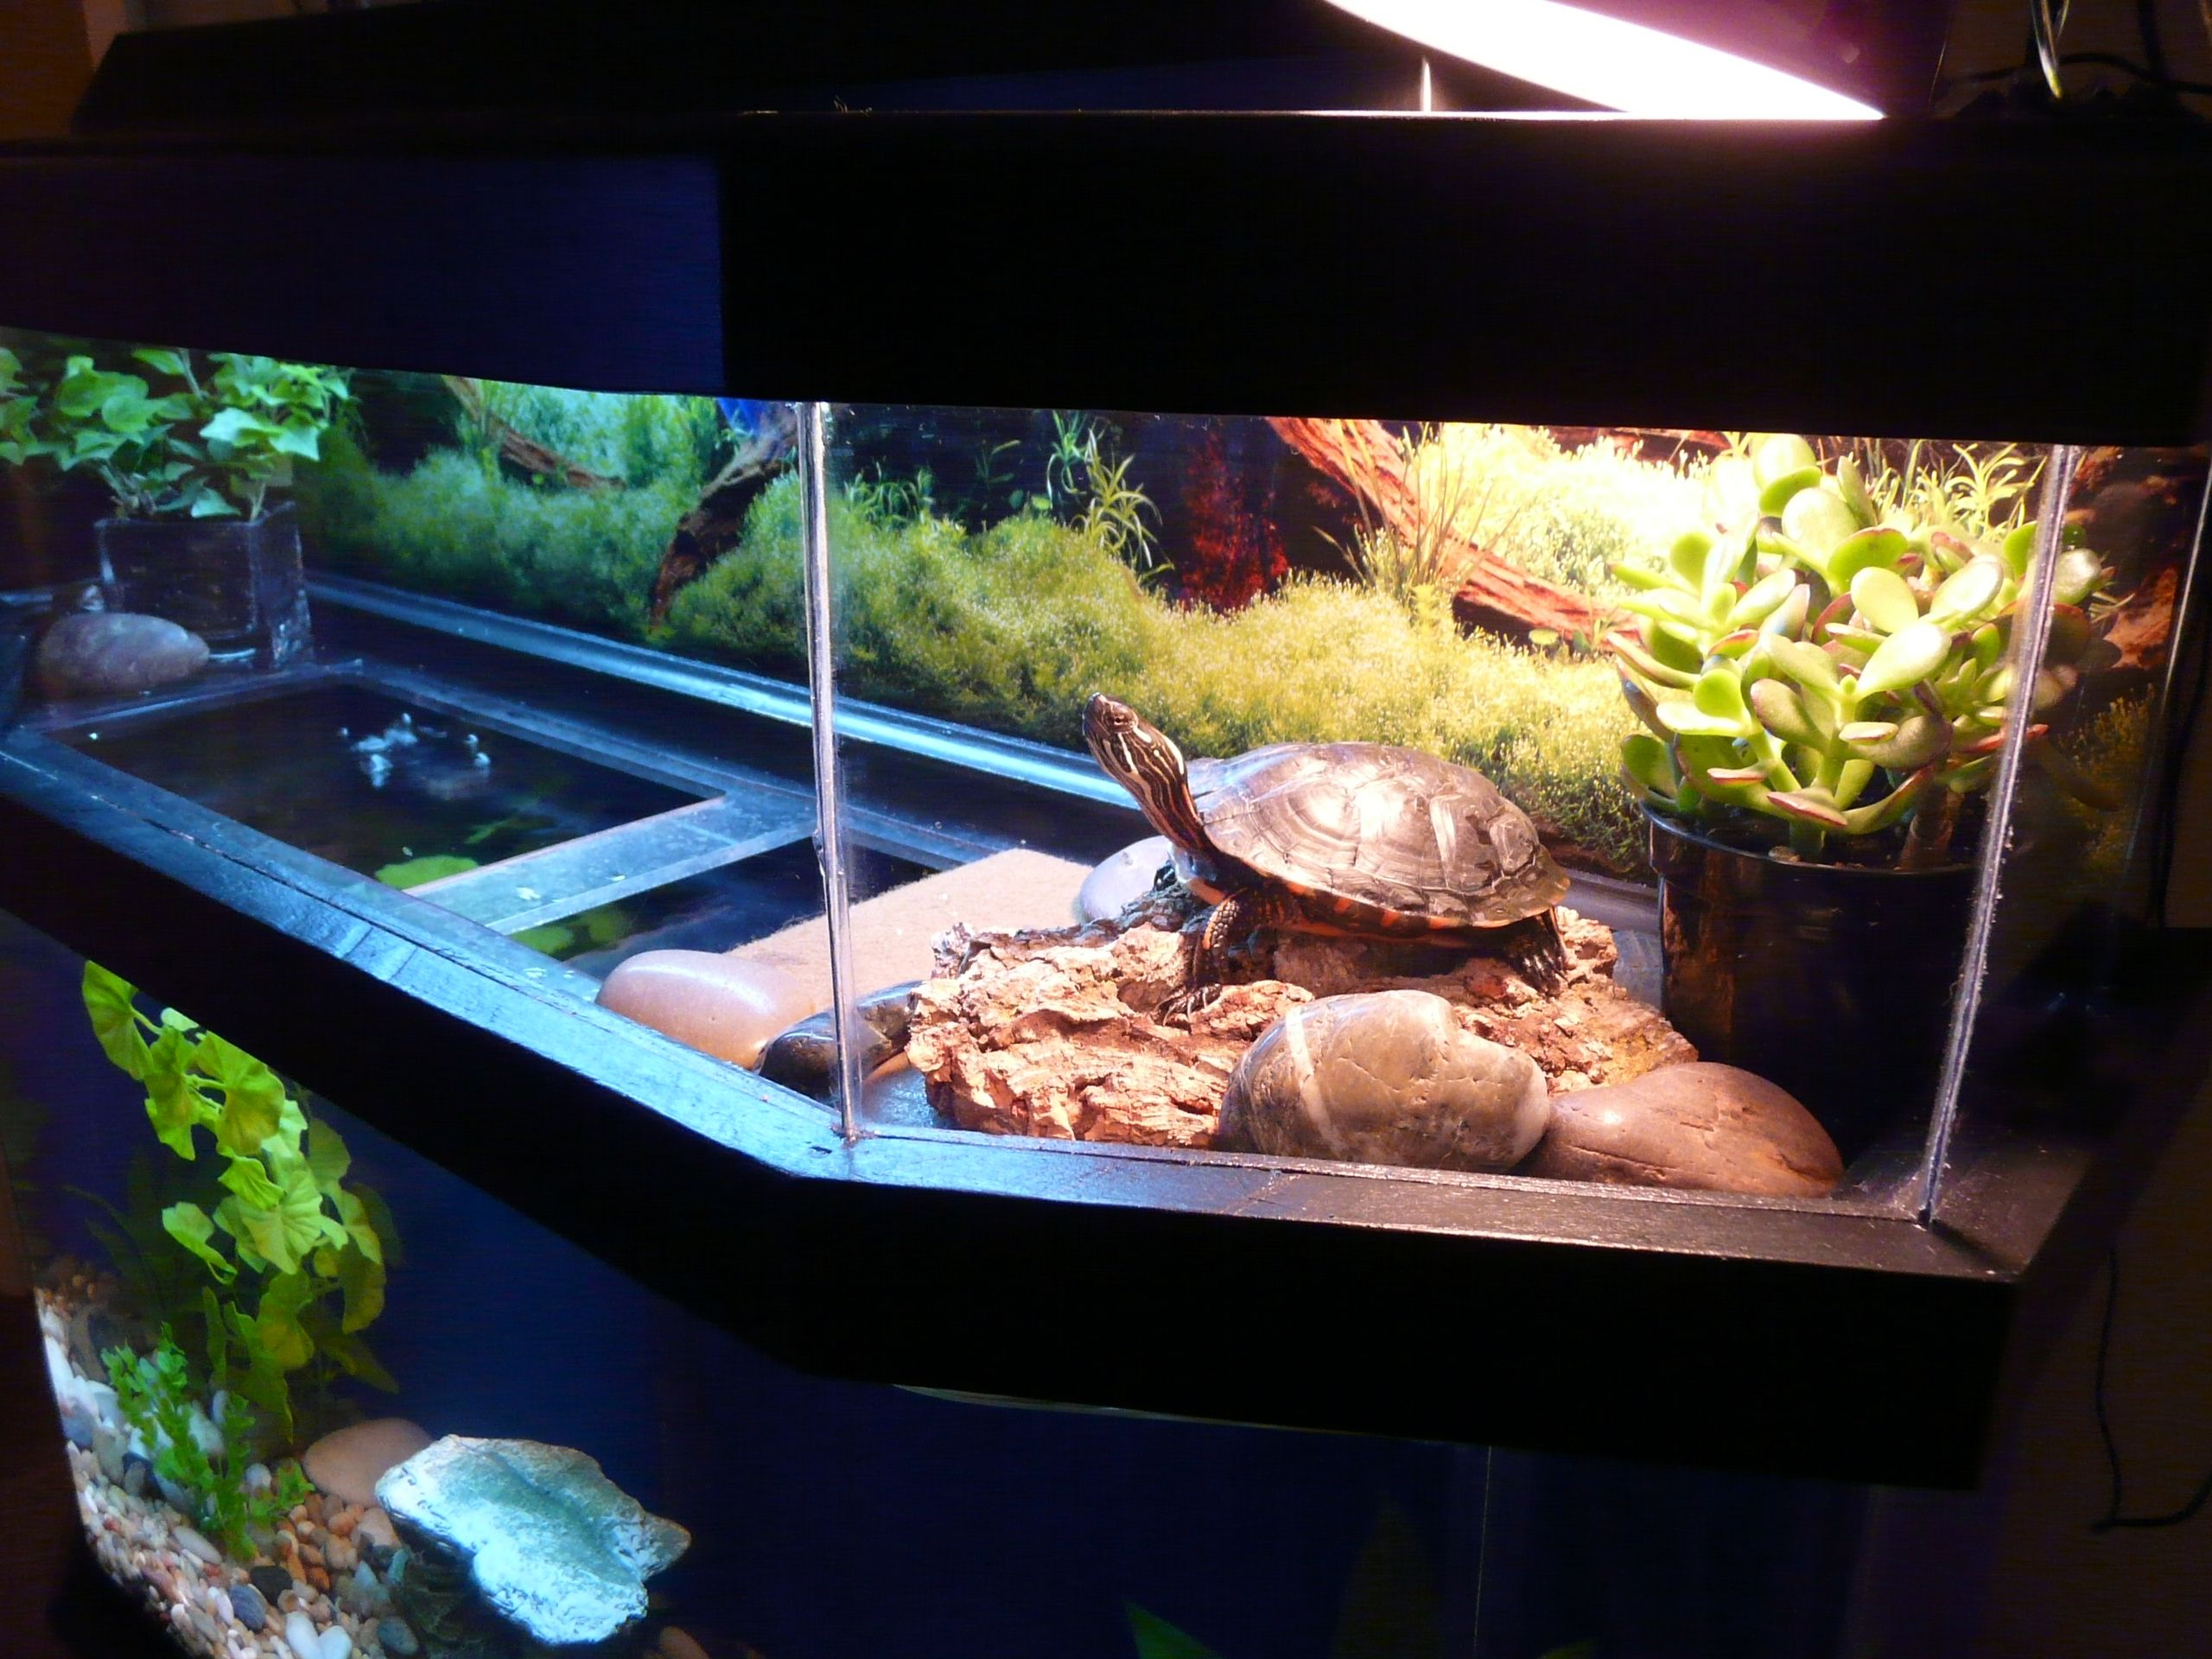 Pin By Gaby Valentin On Pet Stuff Turtle Habitat Pet Turtle Turtle Aquarium